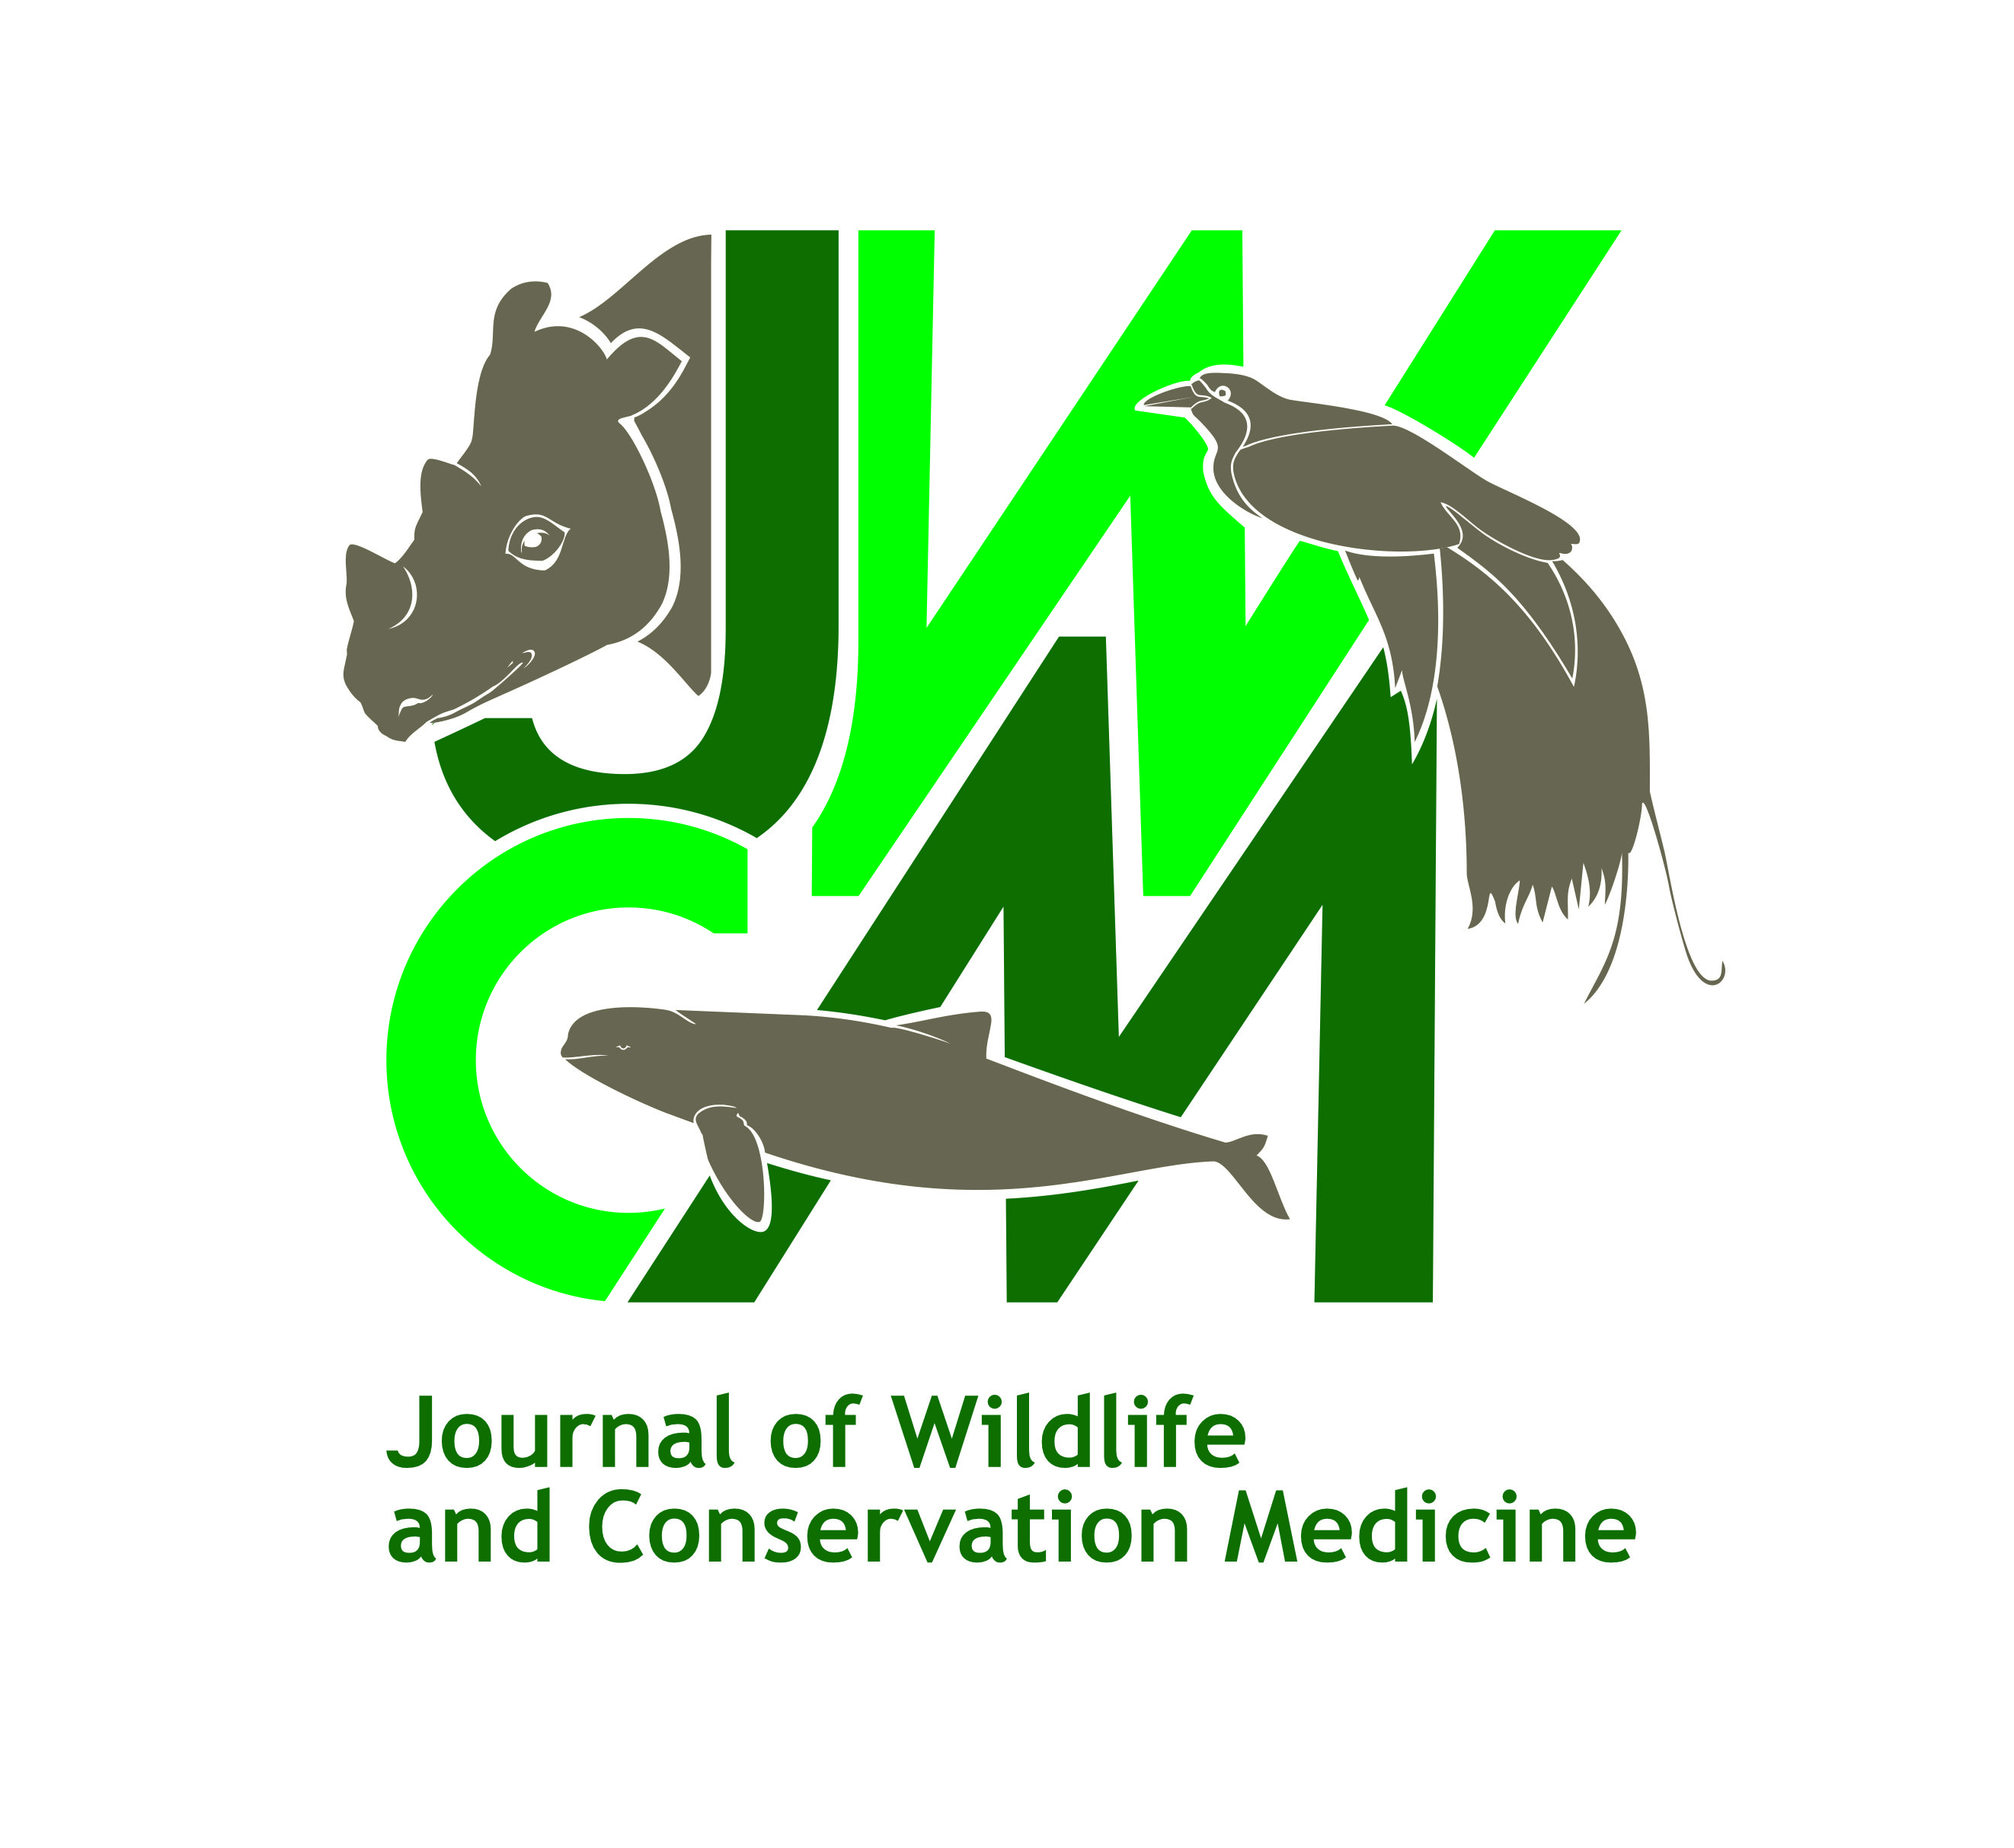 Journal of Wildlife and Conservation Medicine (J Wildl Coserv Med)